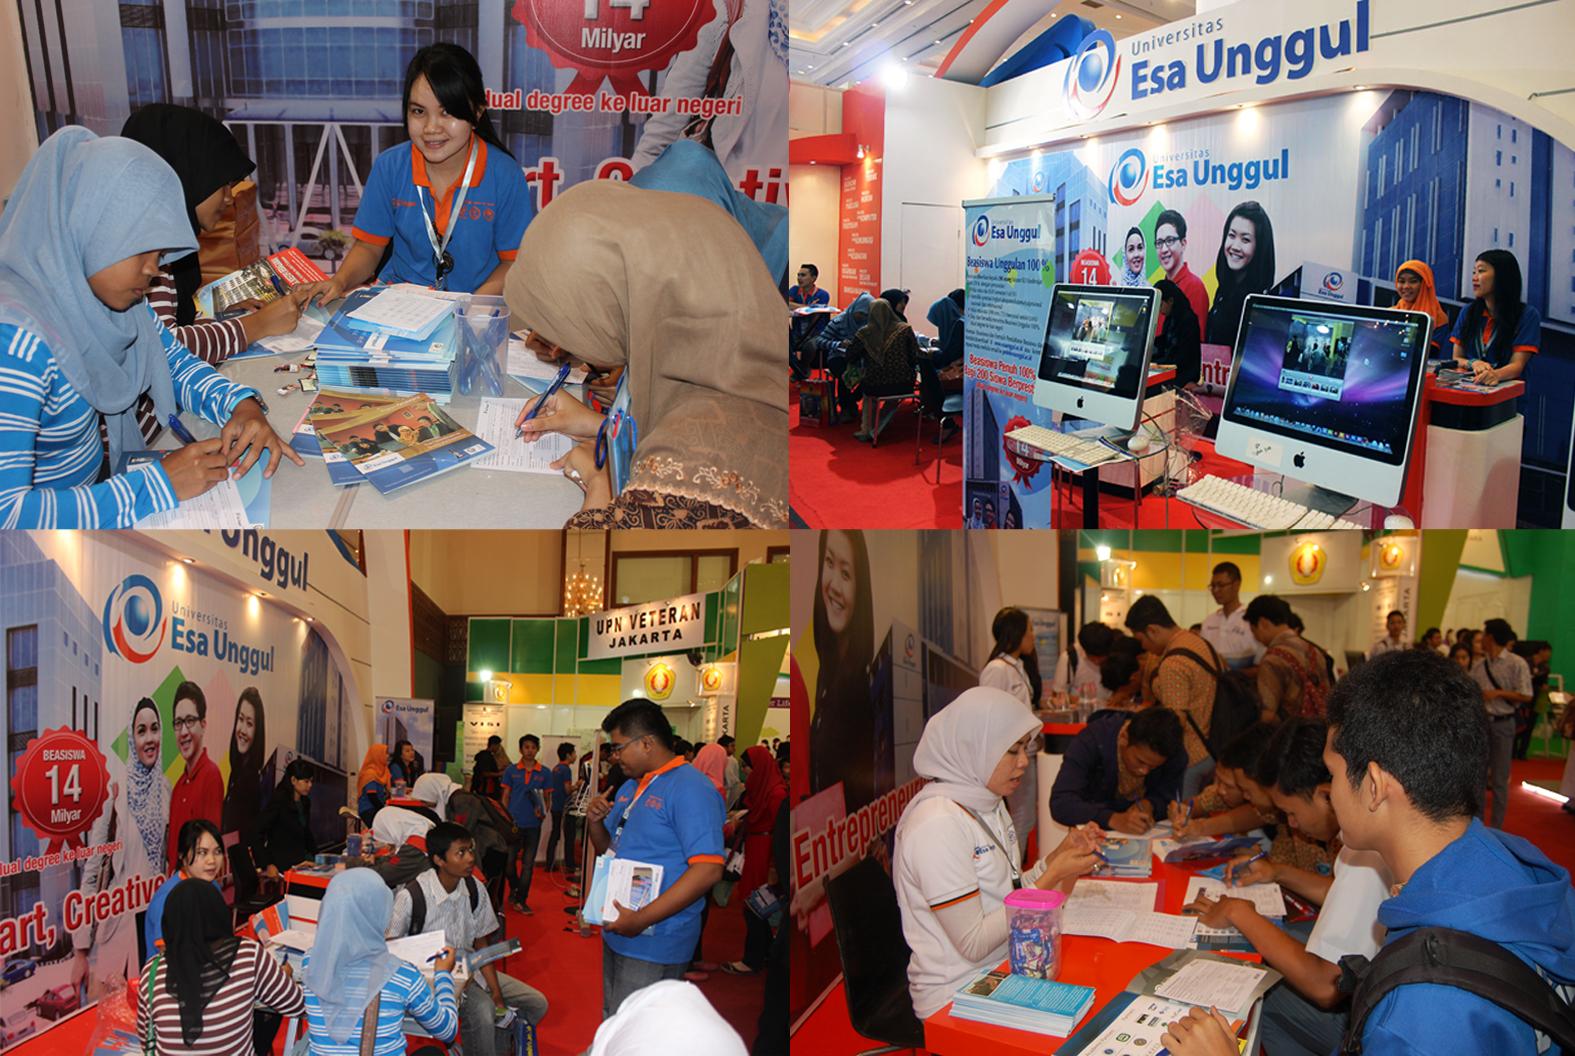 "Universitas Esa Unggul mengikuti pameran pendidikan "" EDUCATION TRAINING EXPO & INADIDAC EXPO 2014″ yang diselenggarakan di Jakarta Convention Center (JCC) pada tanggal 23 – 26 Januari 2014,"